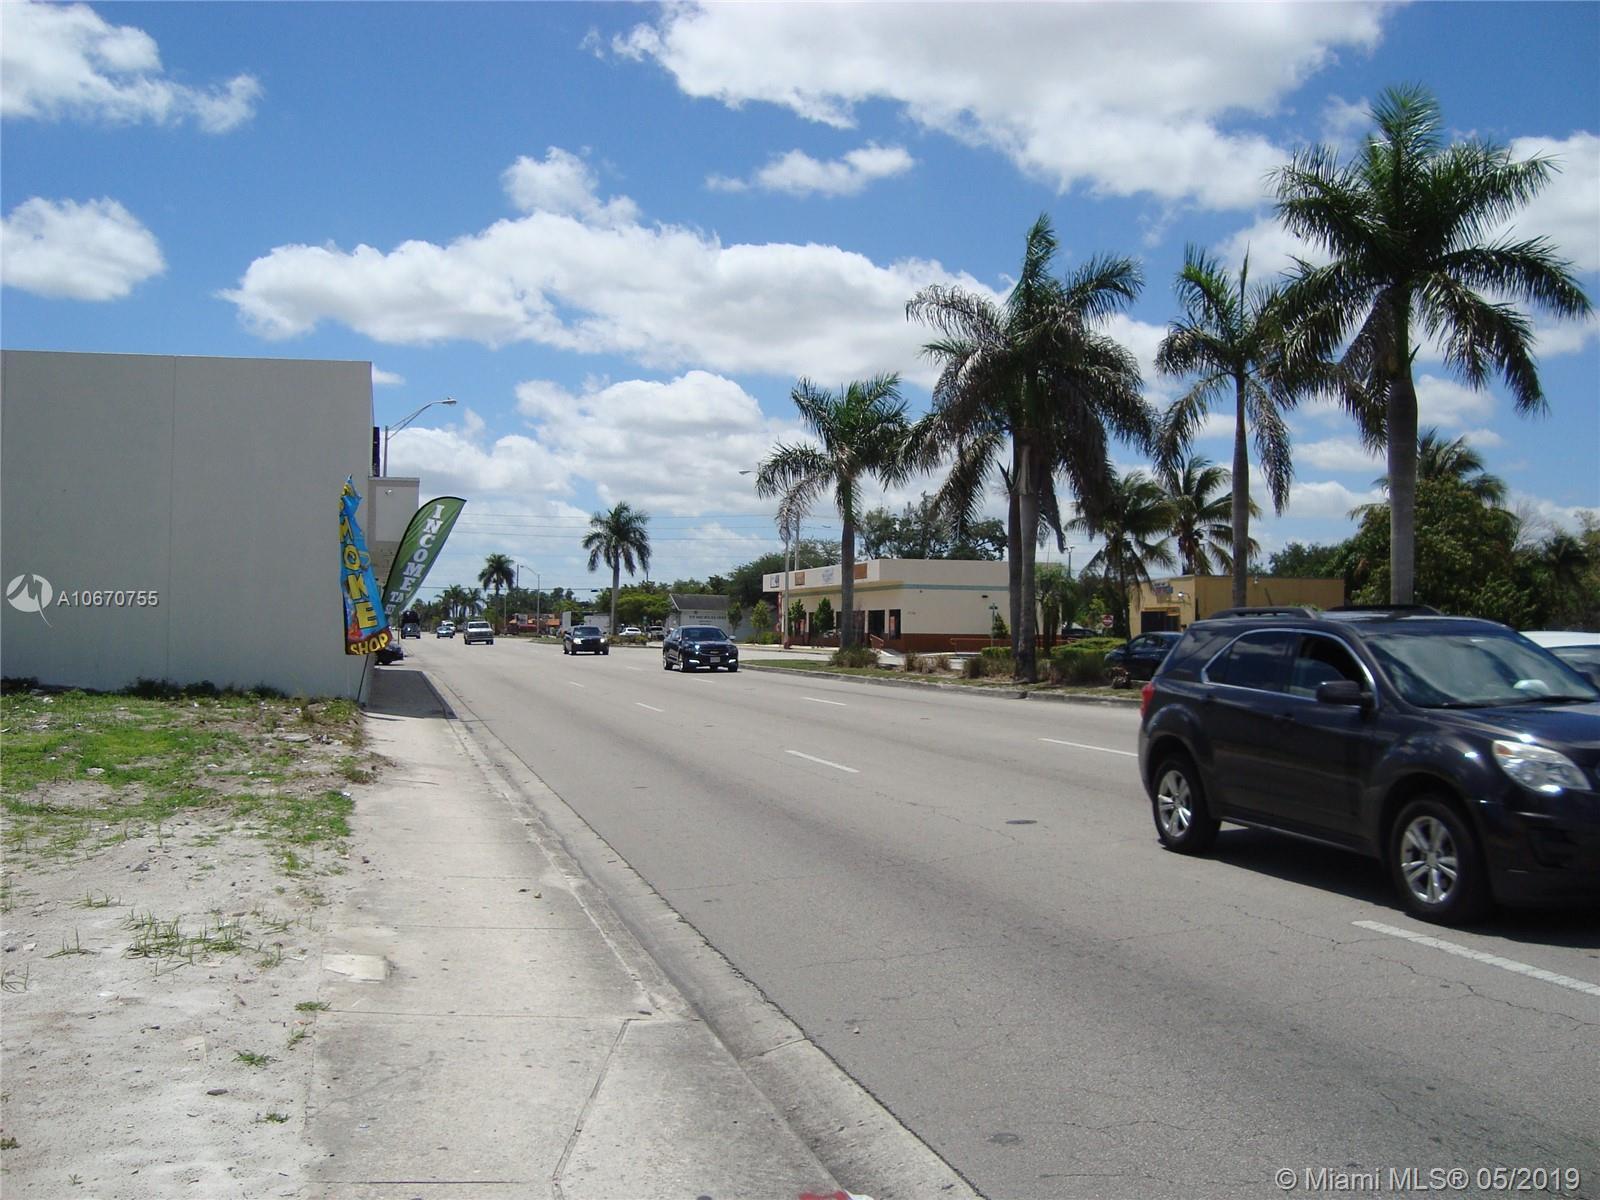 9229 Nw 22 Ave, Miami FL 33147 - Photo 2